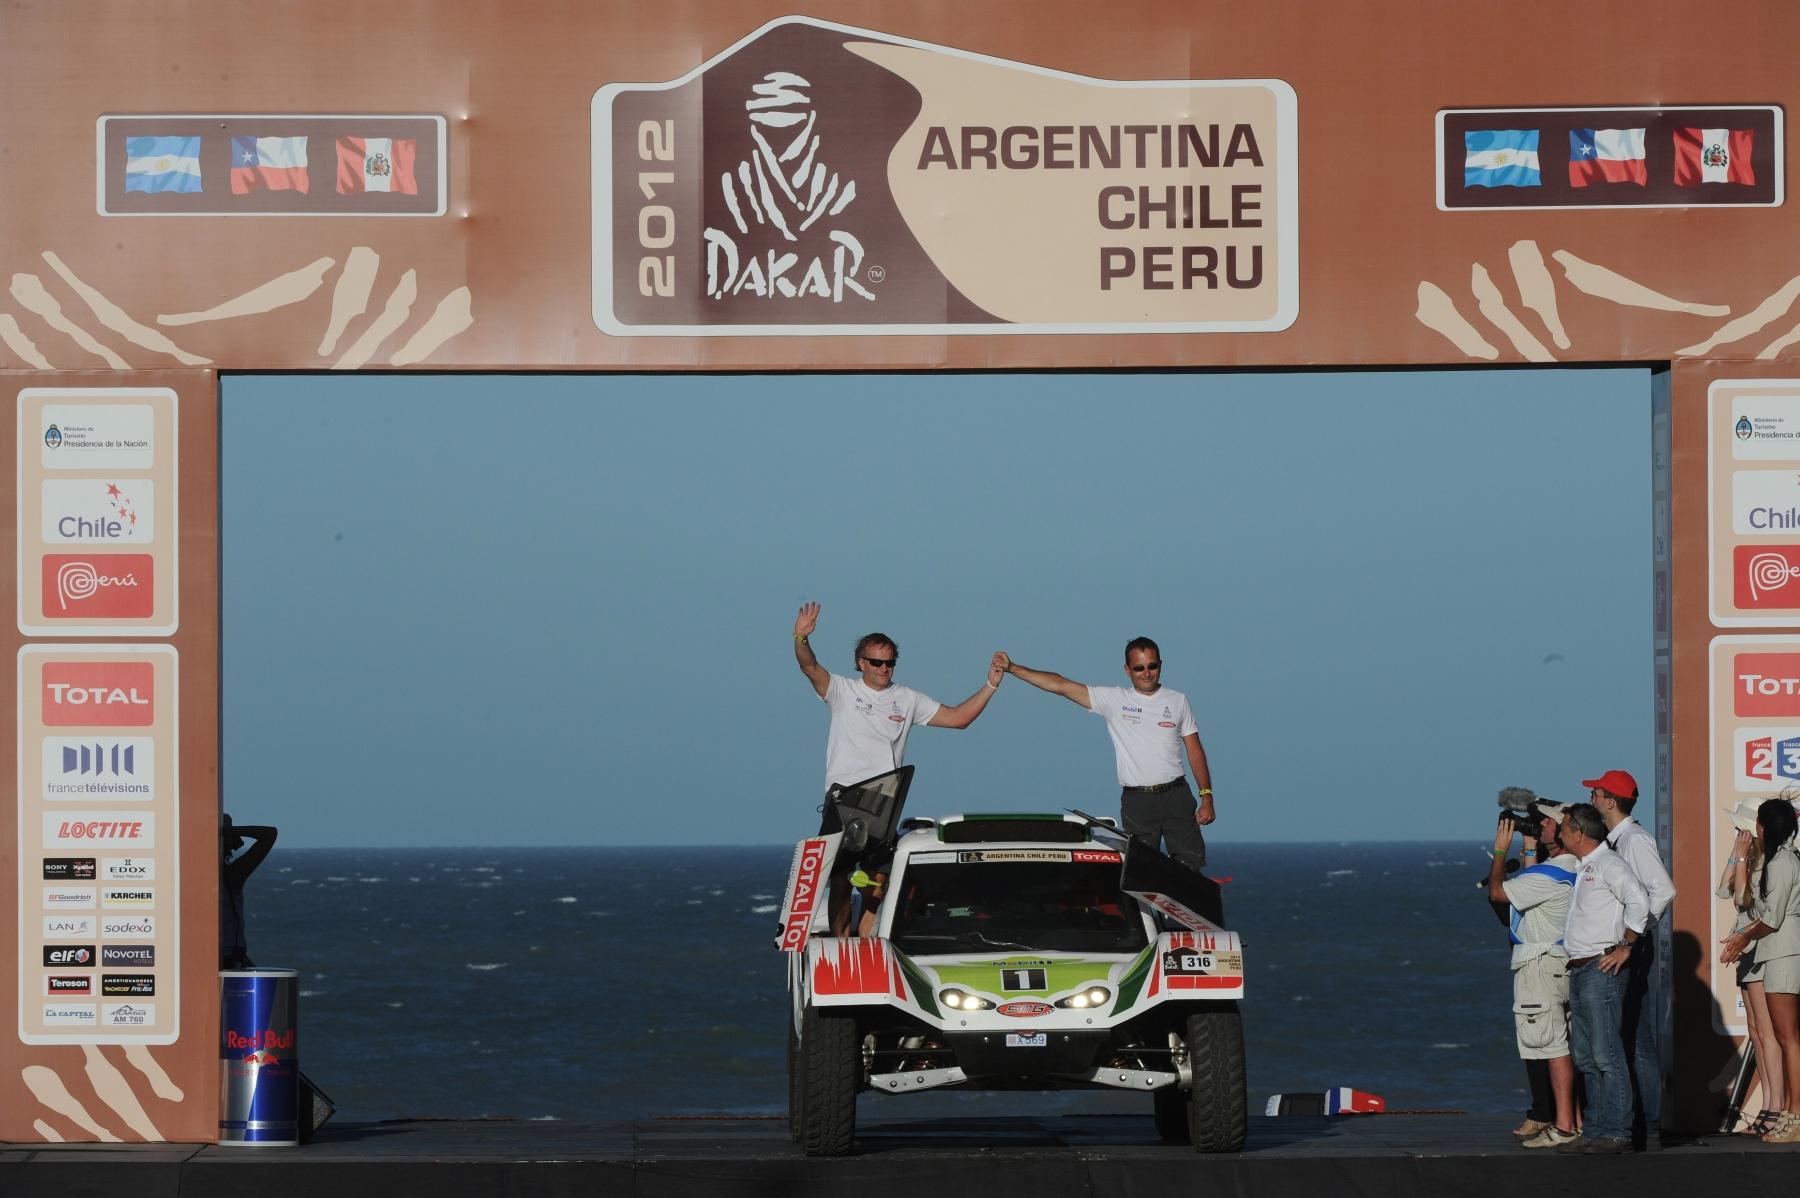 MOTORSPORT - DAKAR ARGENTINA CHILE PERU 2012 - SCRUTINEERING - MAR DEL PLATA (ARG) - 29 TO 31/11/2011- PHOTO : ERIC VARGIOLU / DPPI